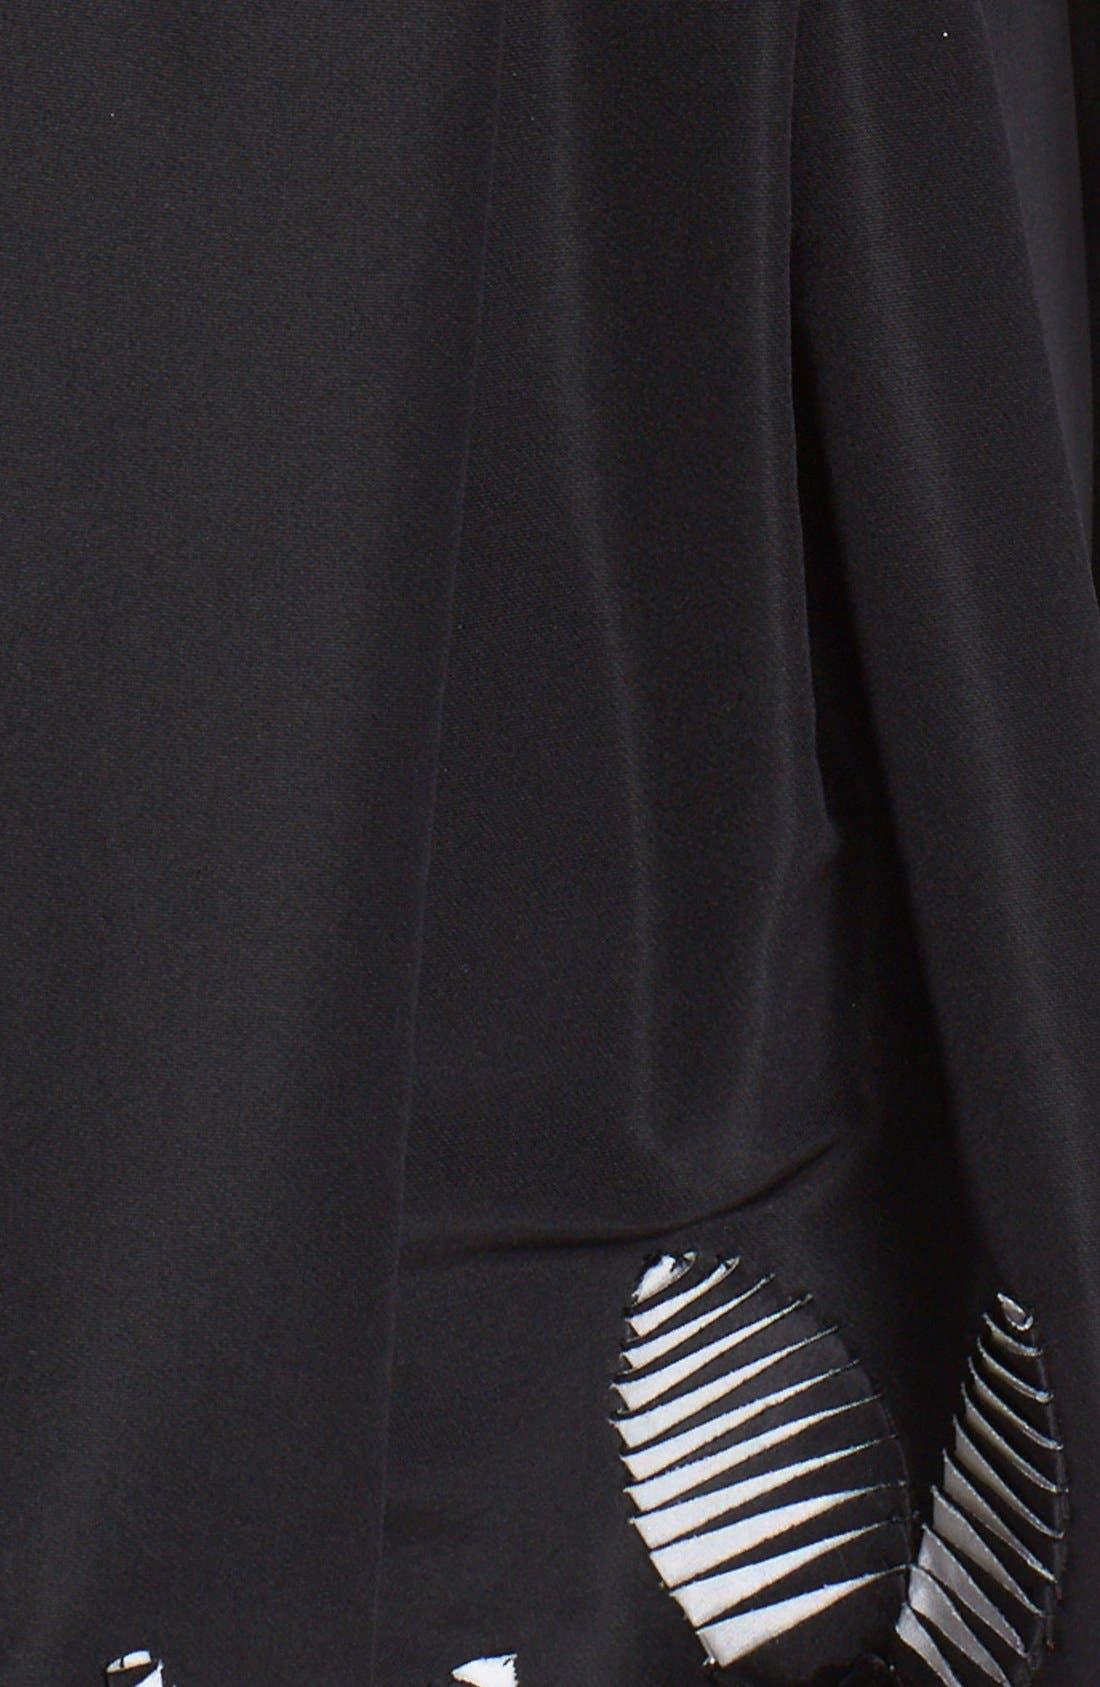 Alternate Image 3  - Carolina Herrera Embellished Two-Tone Scoop Neck Faille Fit & Flare Dress